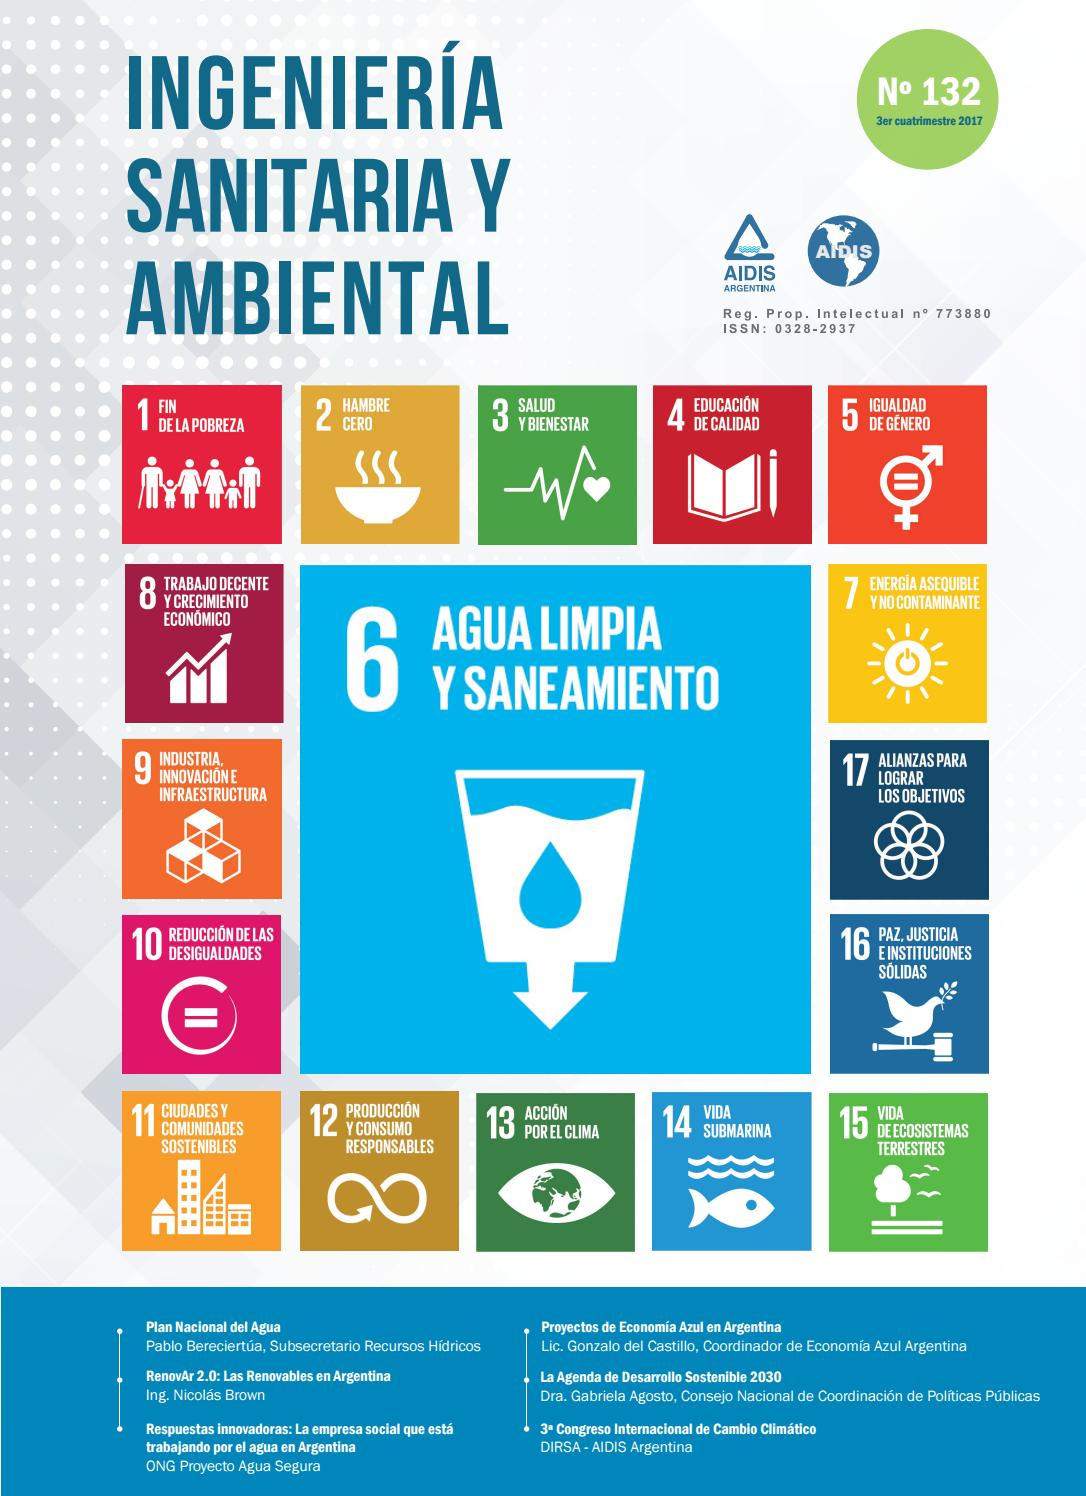 ISA - Ingeniería Sanitaria y Ambiental 132 by Aidis Argentina - issuu